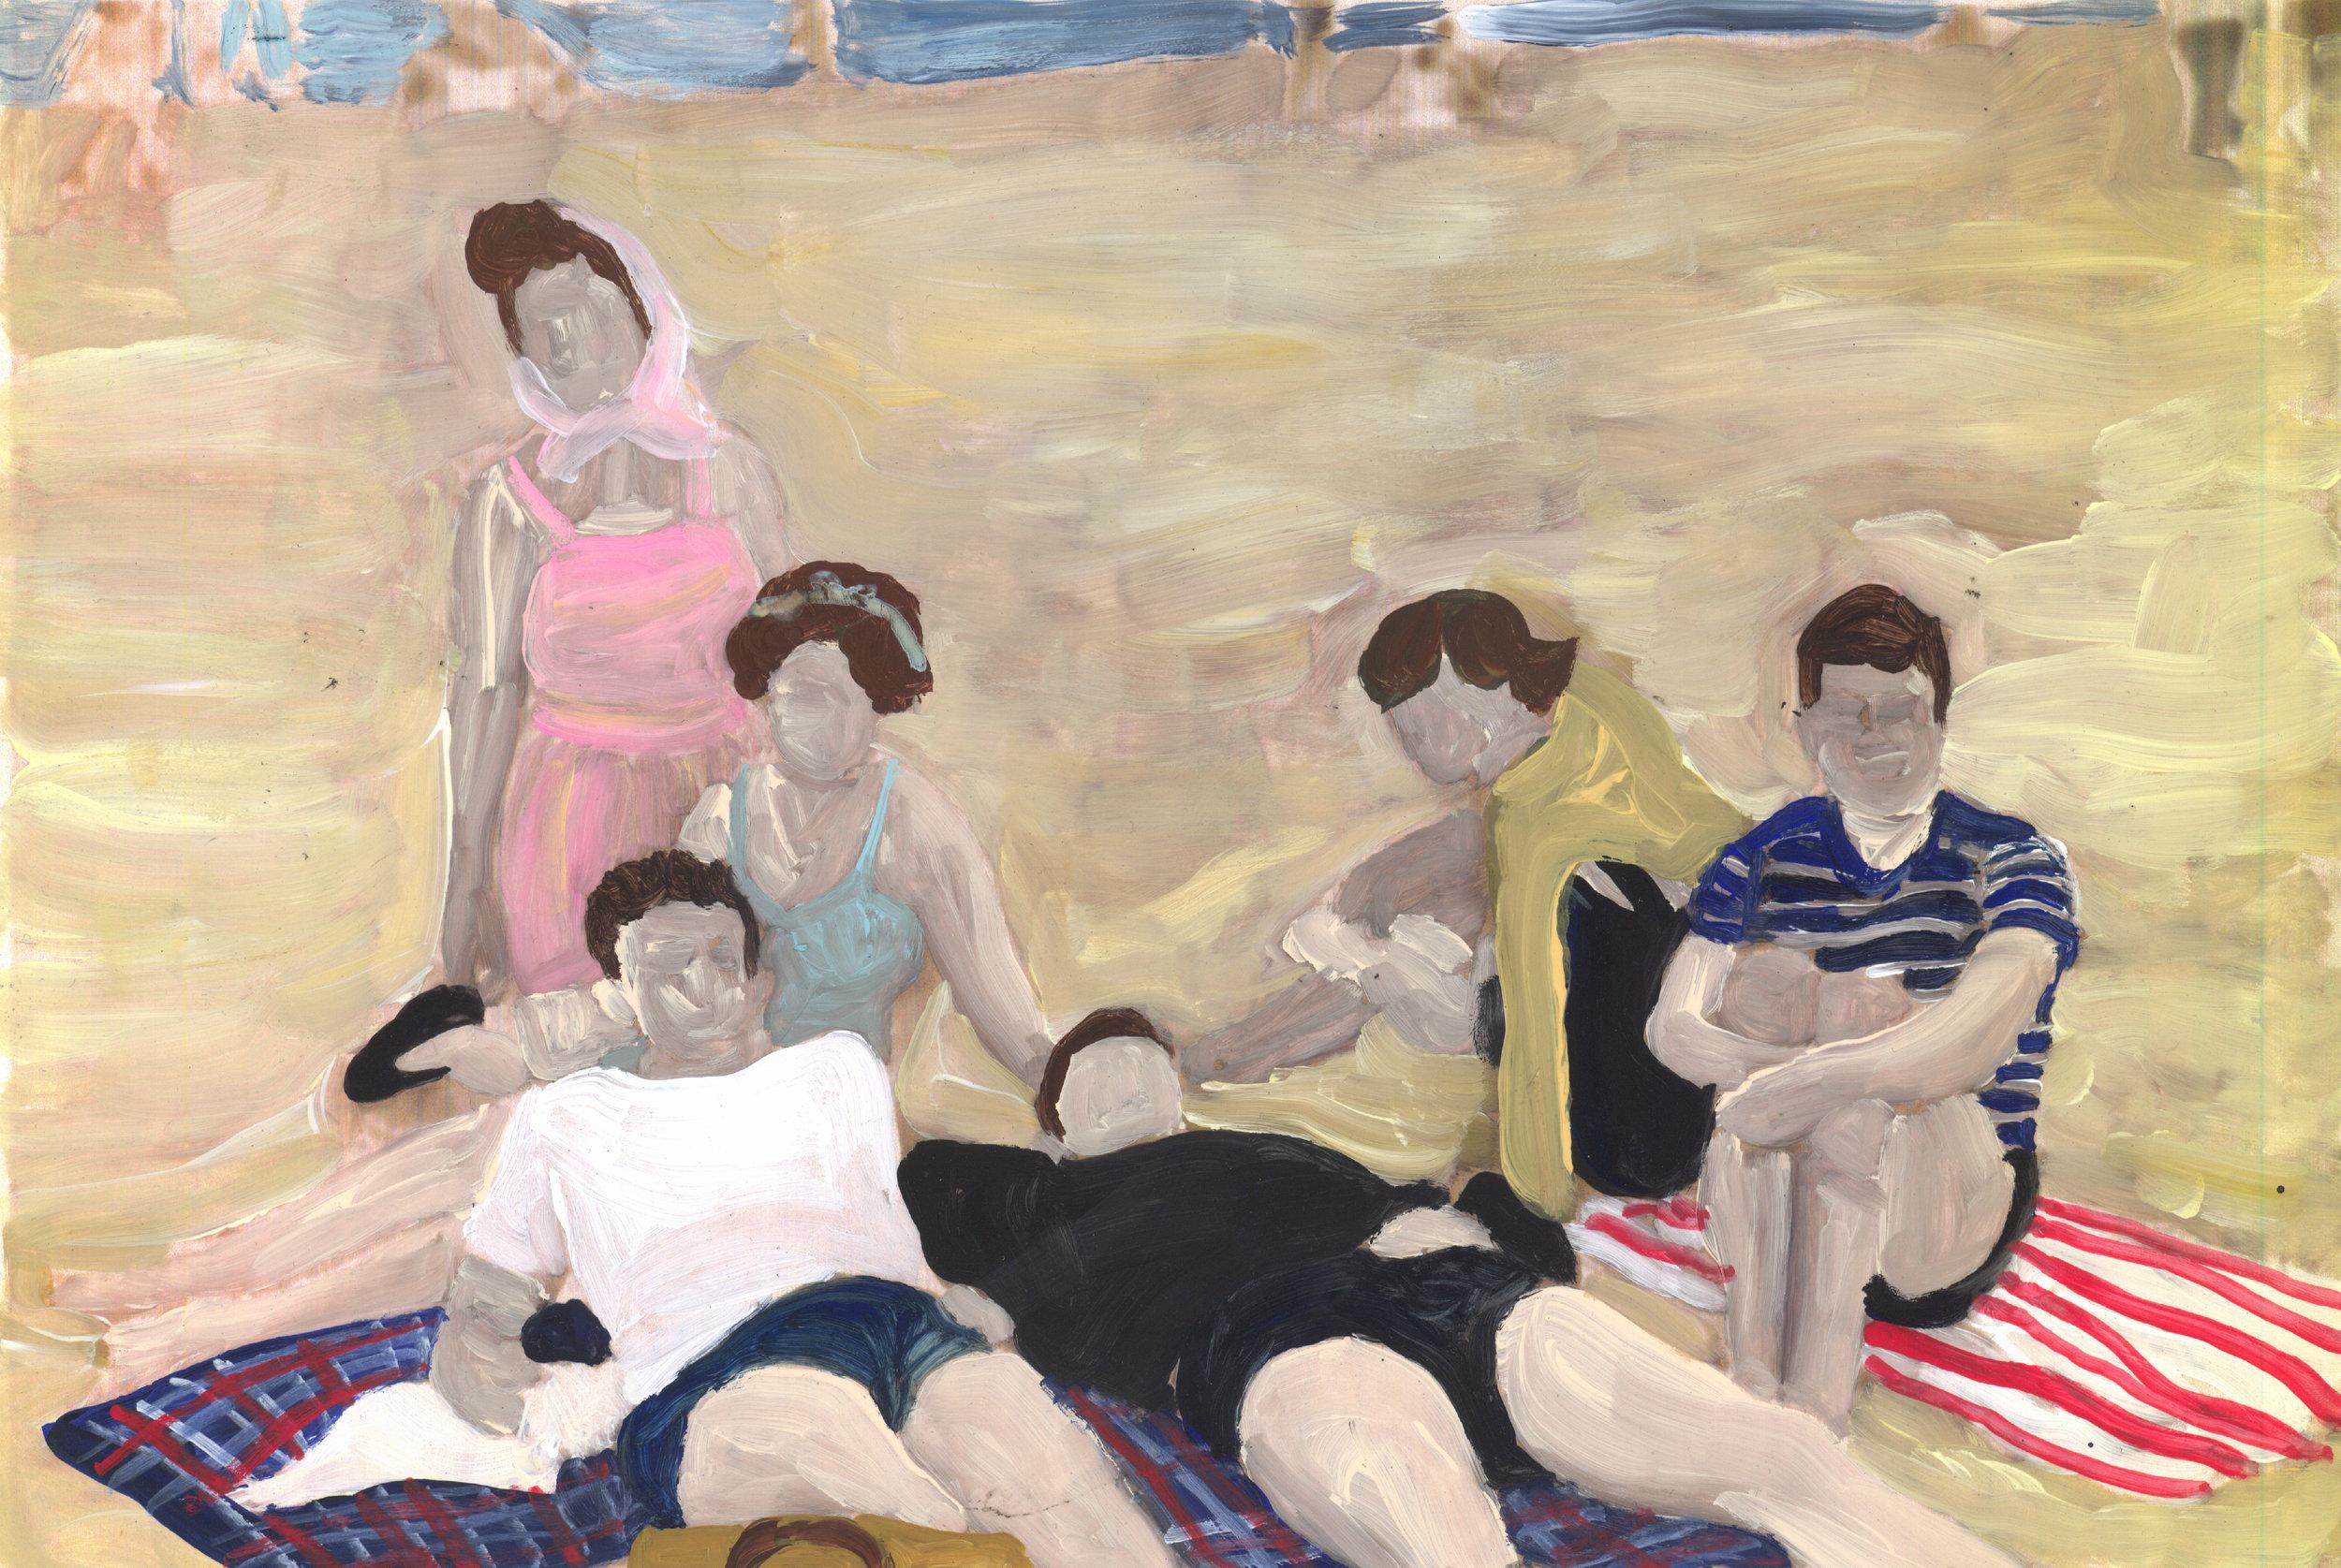 Rockaway beach day